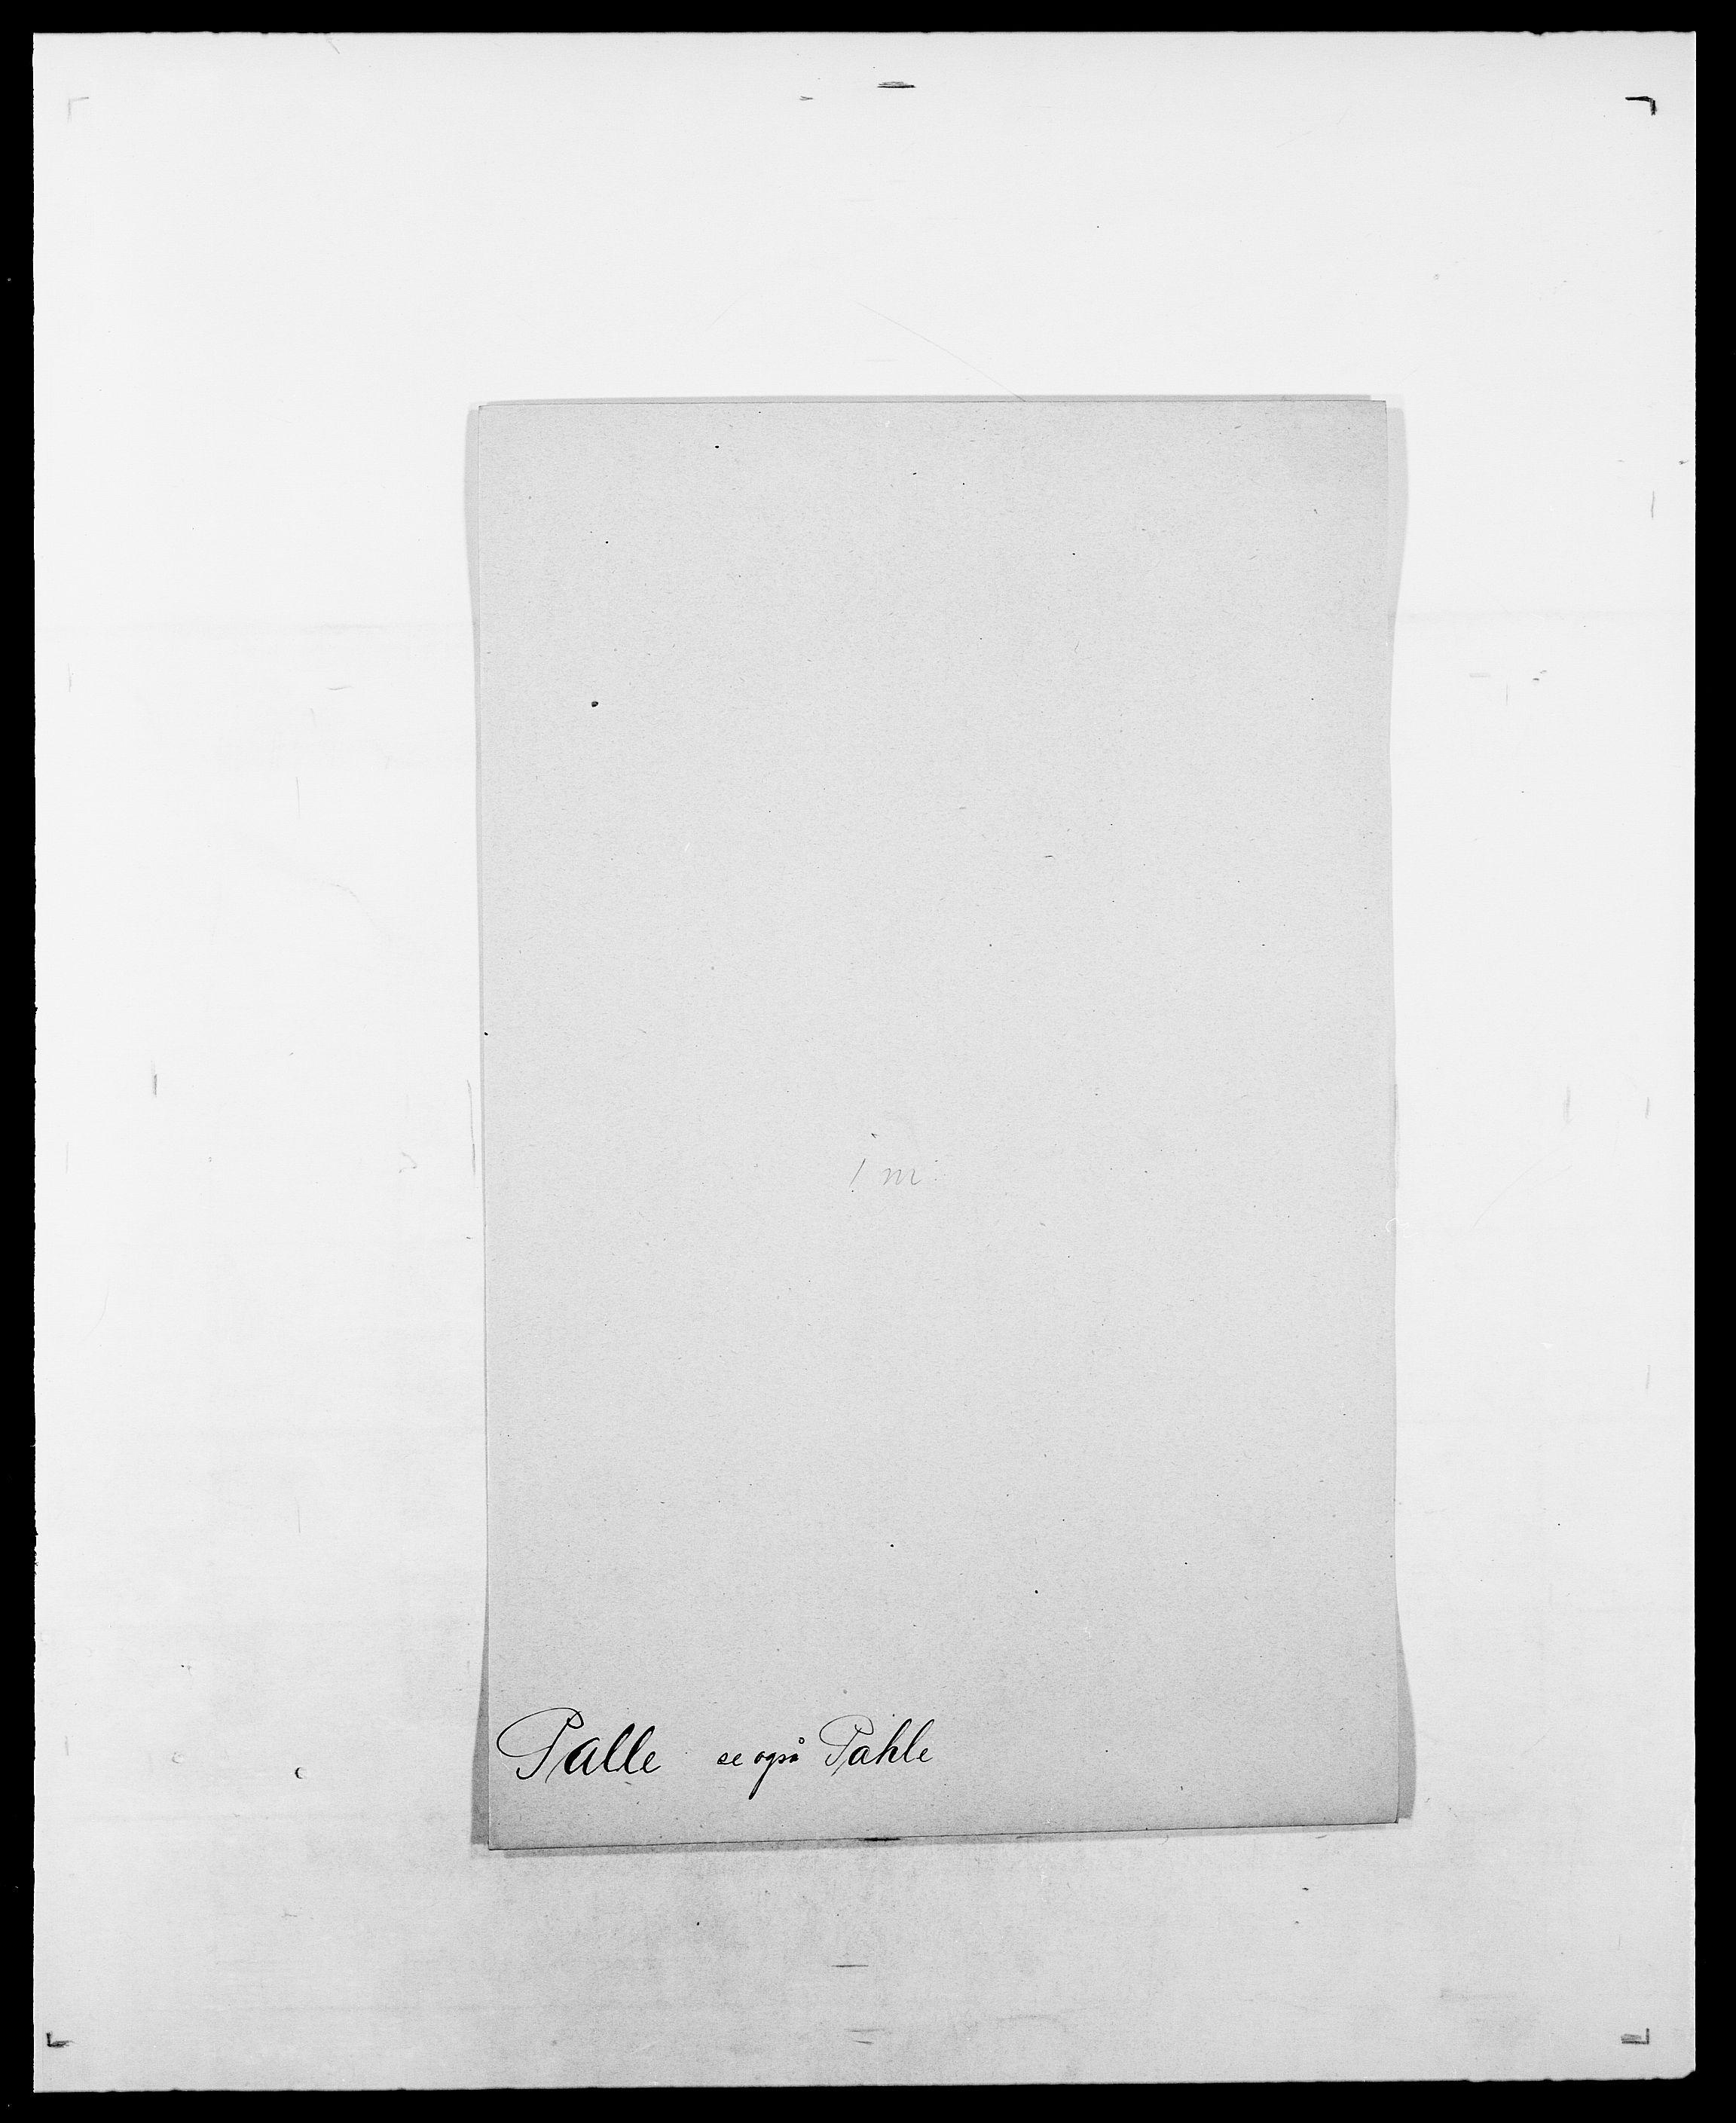 SAO, Delgobe, Charles Antoine - samling, D/Da/L0030: Paars - Pittelkov, s. 62